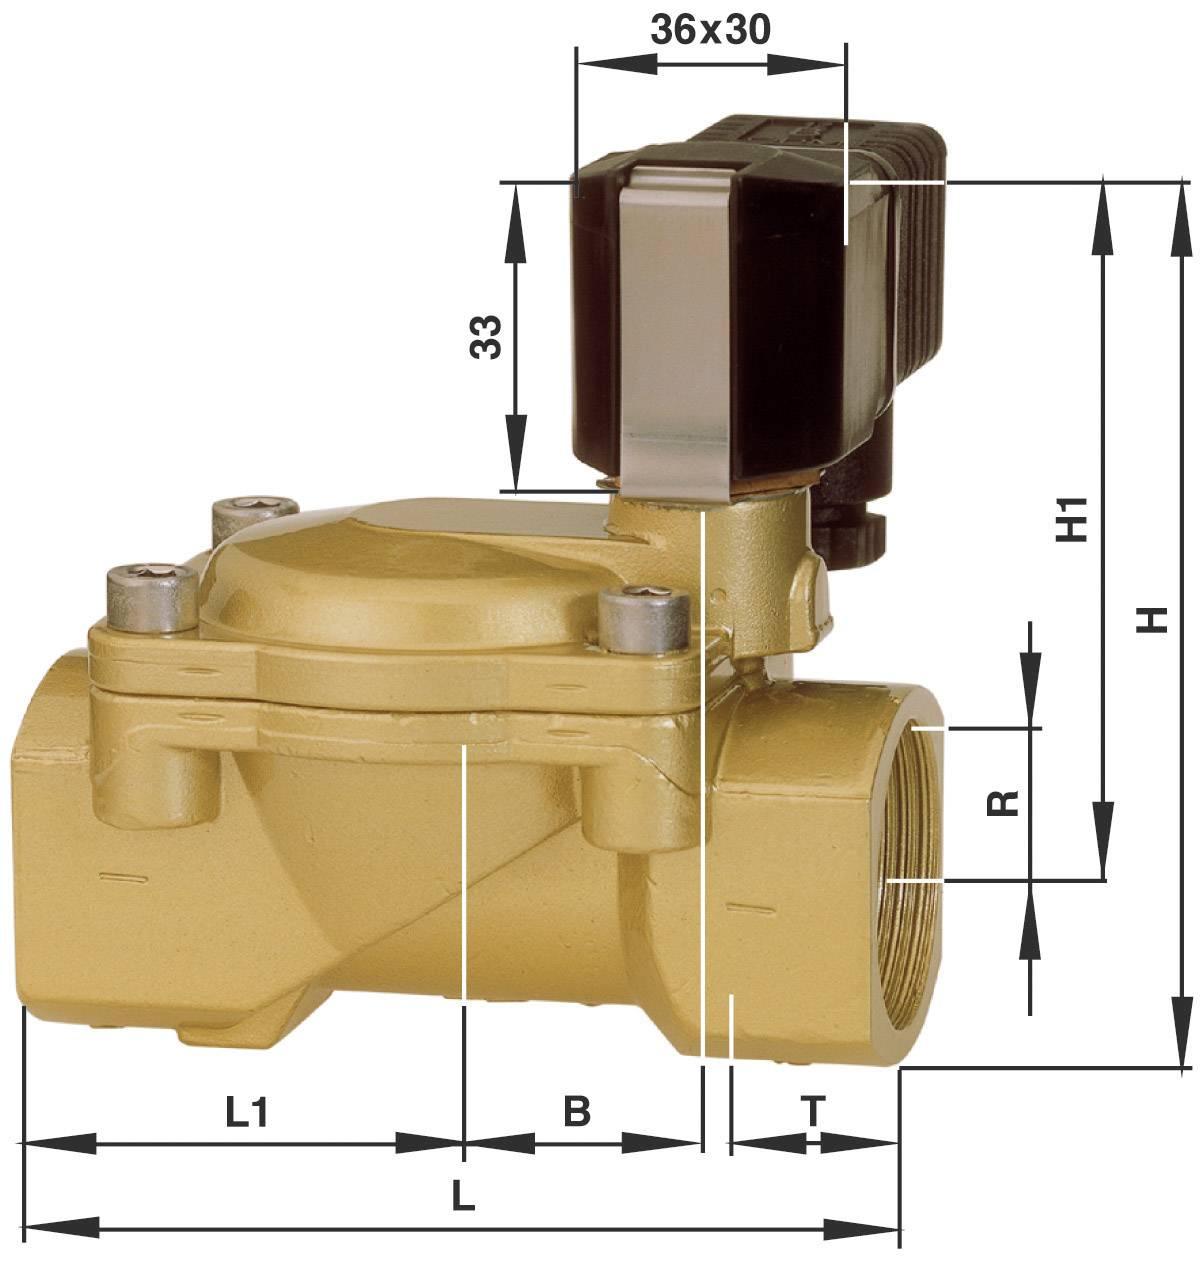 2/2-cestný mechanicky odolný ventil pneumatiky Busch Jost 8240200.9101.02400, G 1/2, 24 V/DC